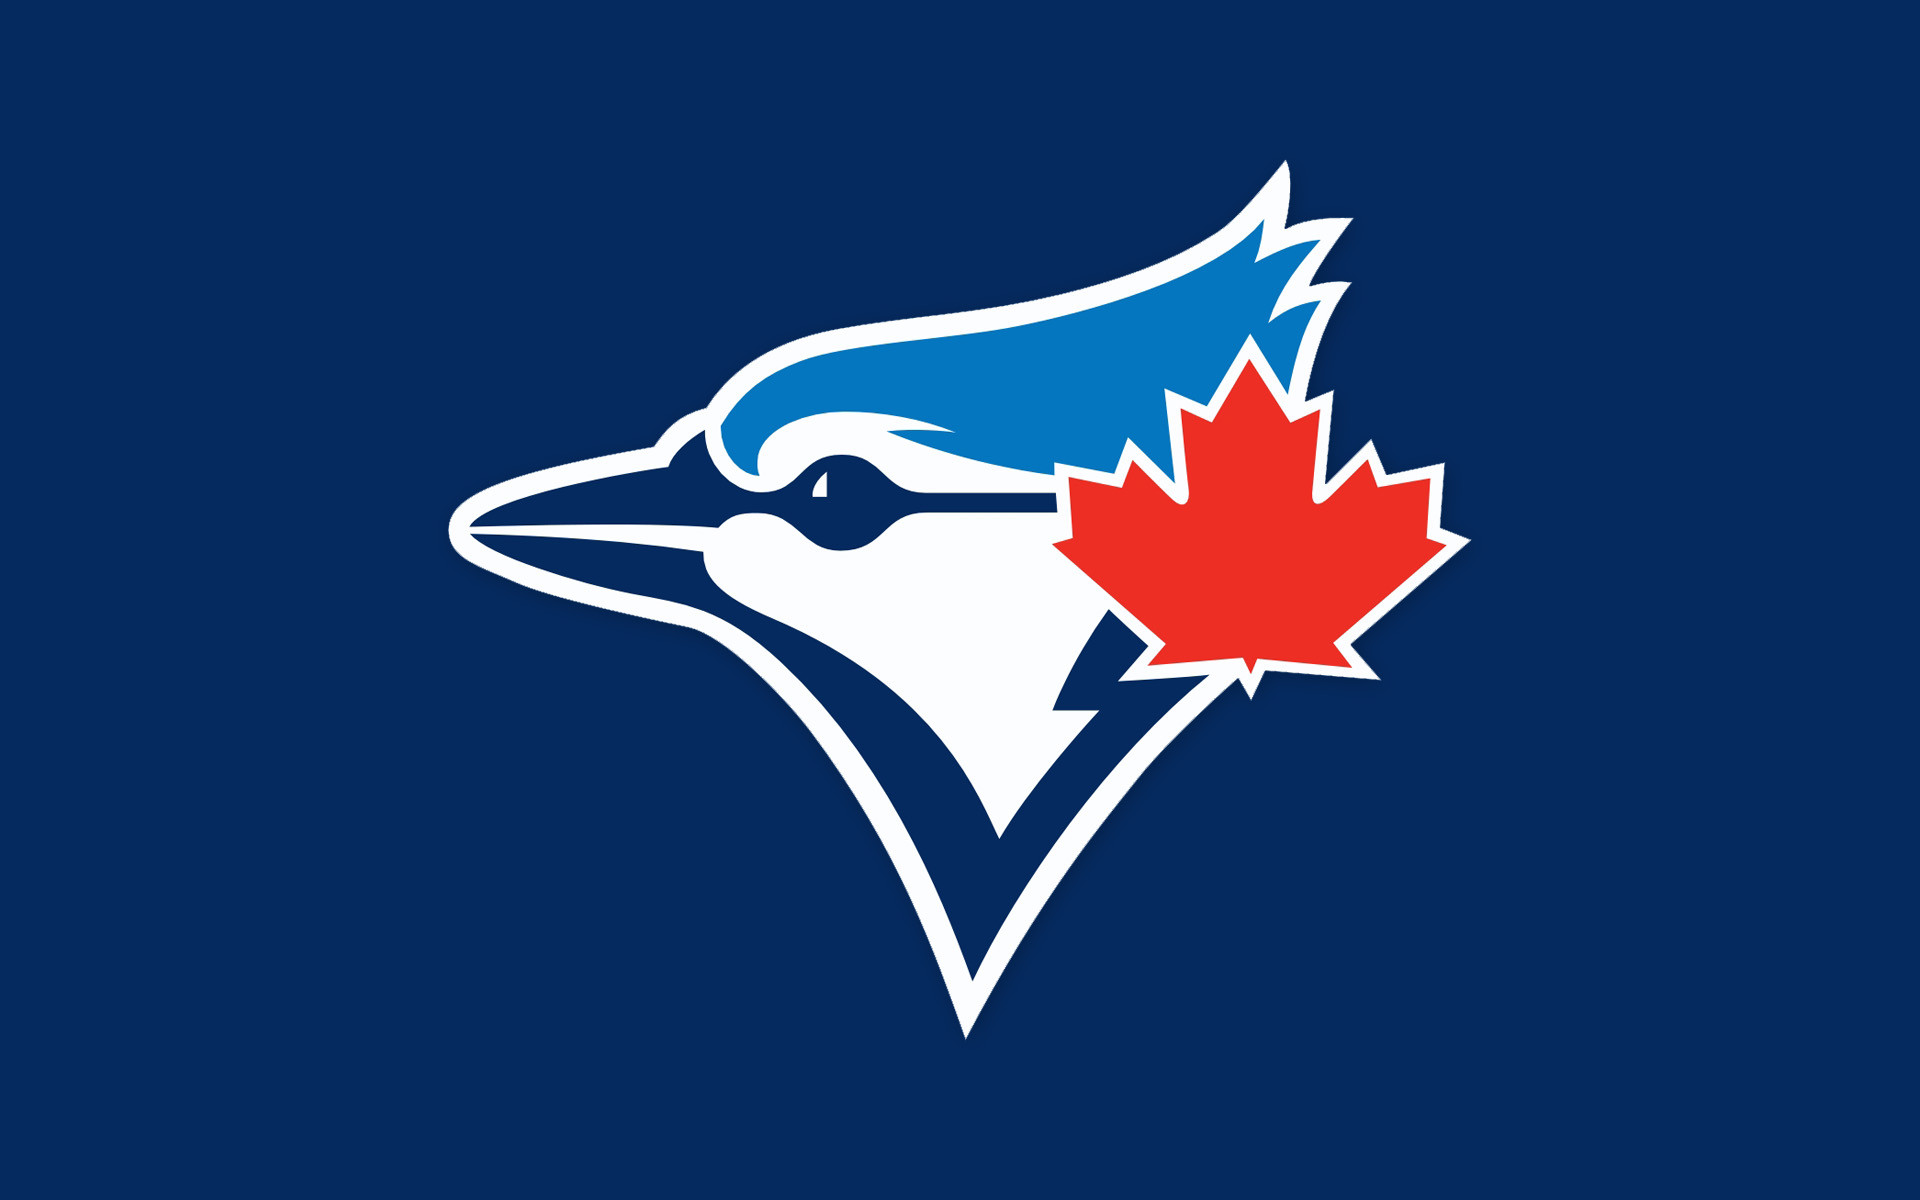 7 HD Toronto Blue Jays Wallpapers